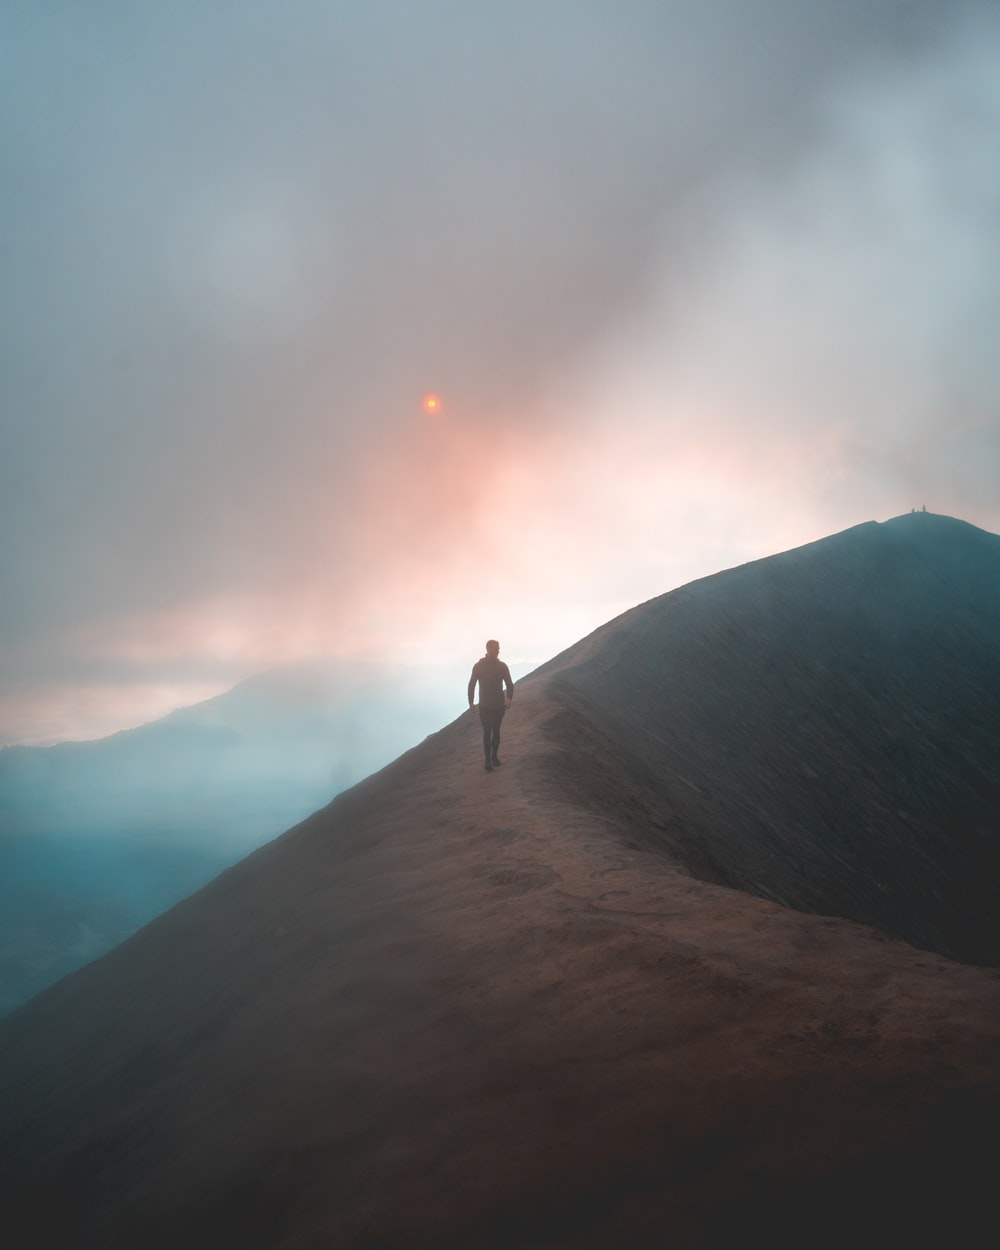 man walking on hill